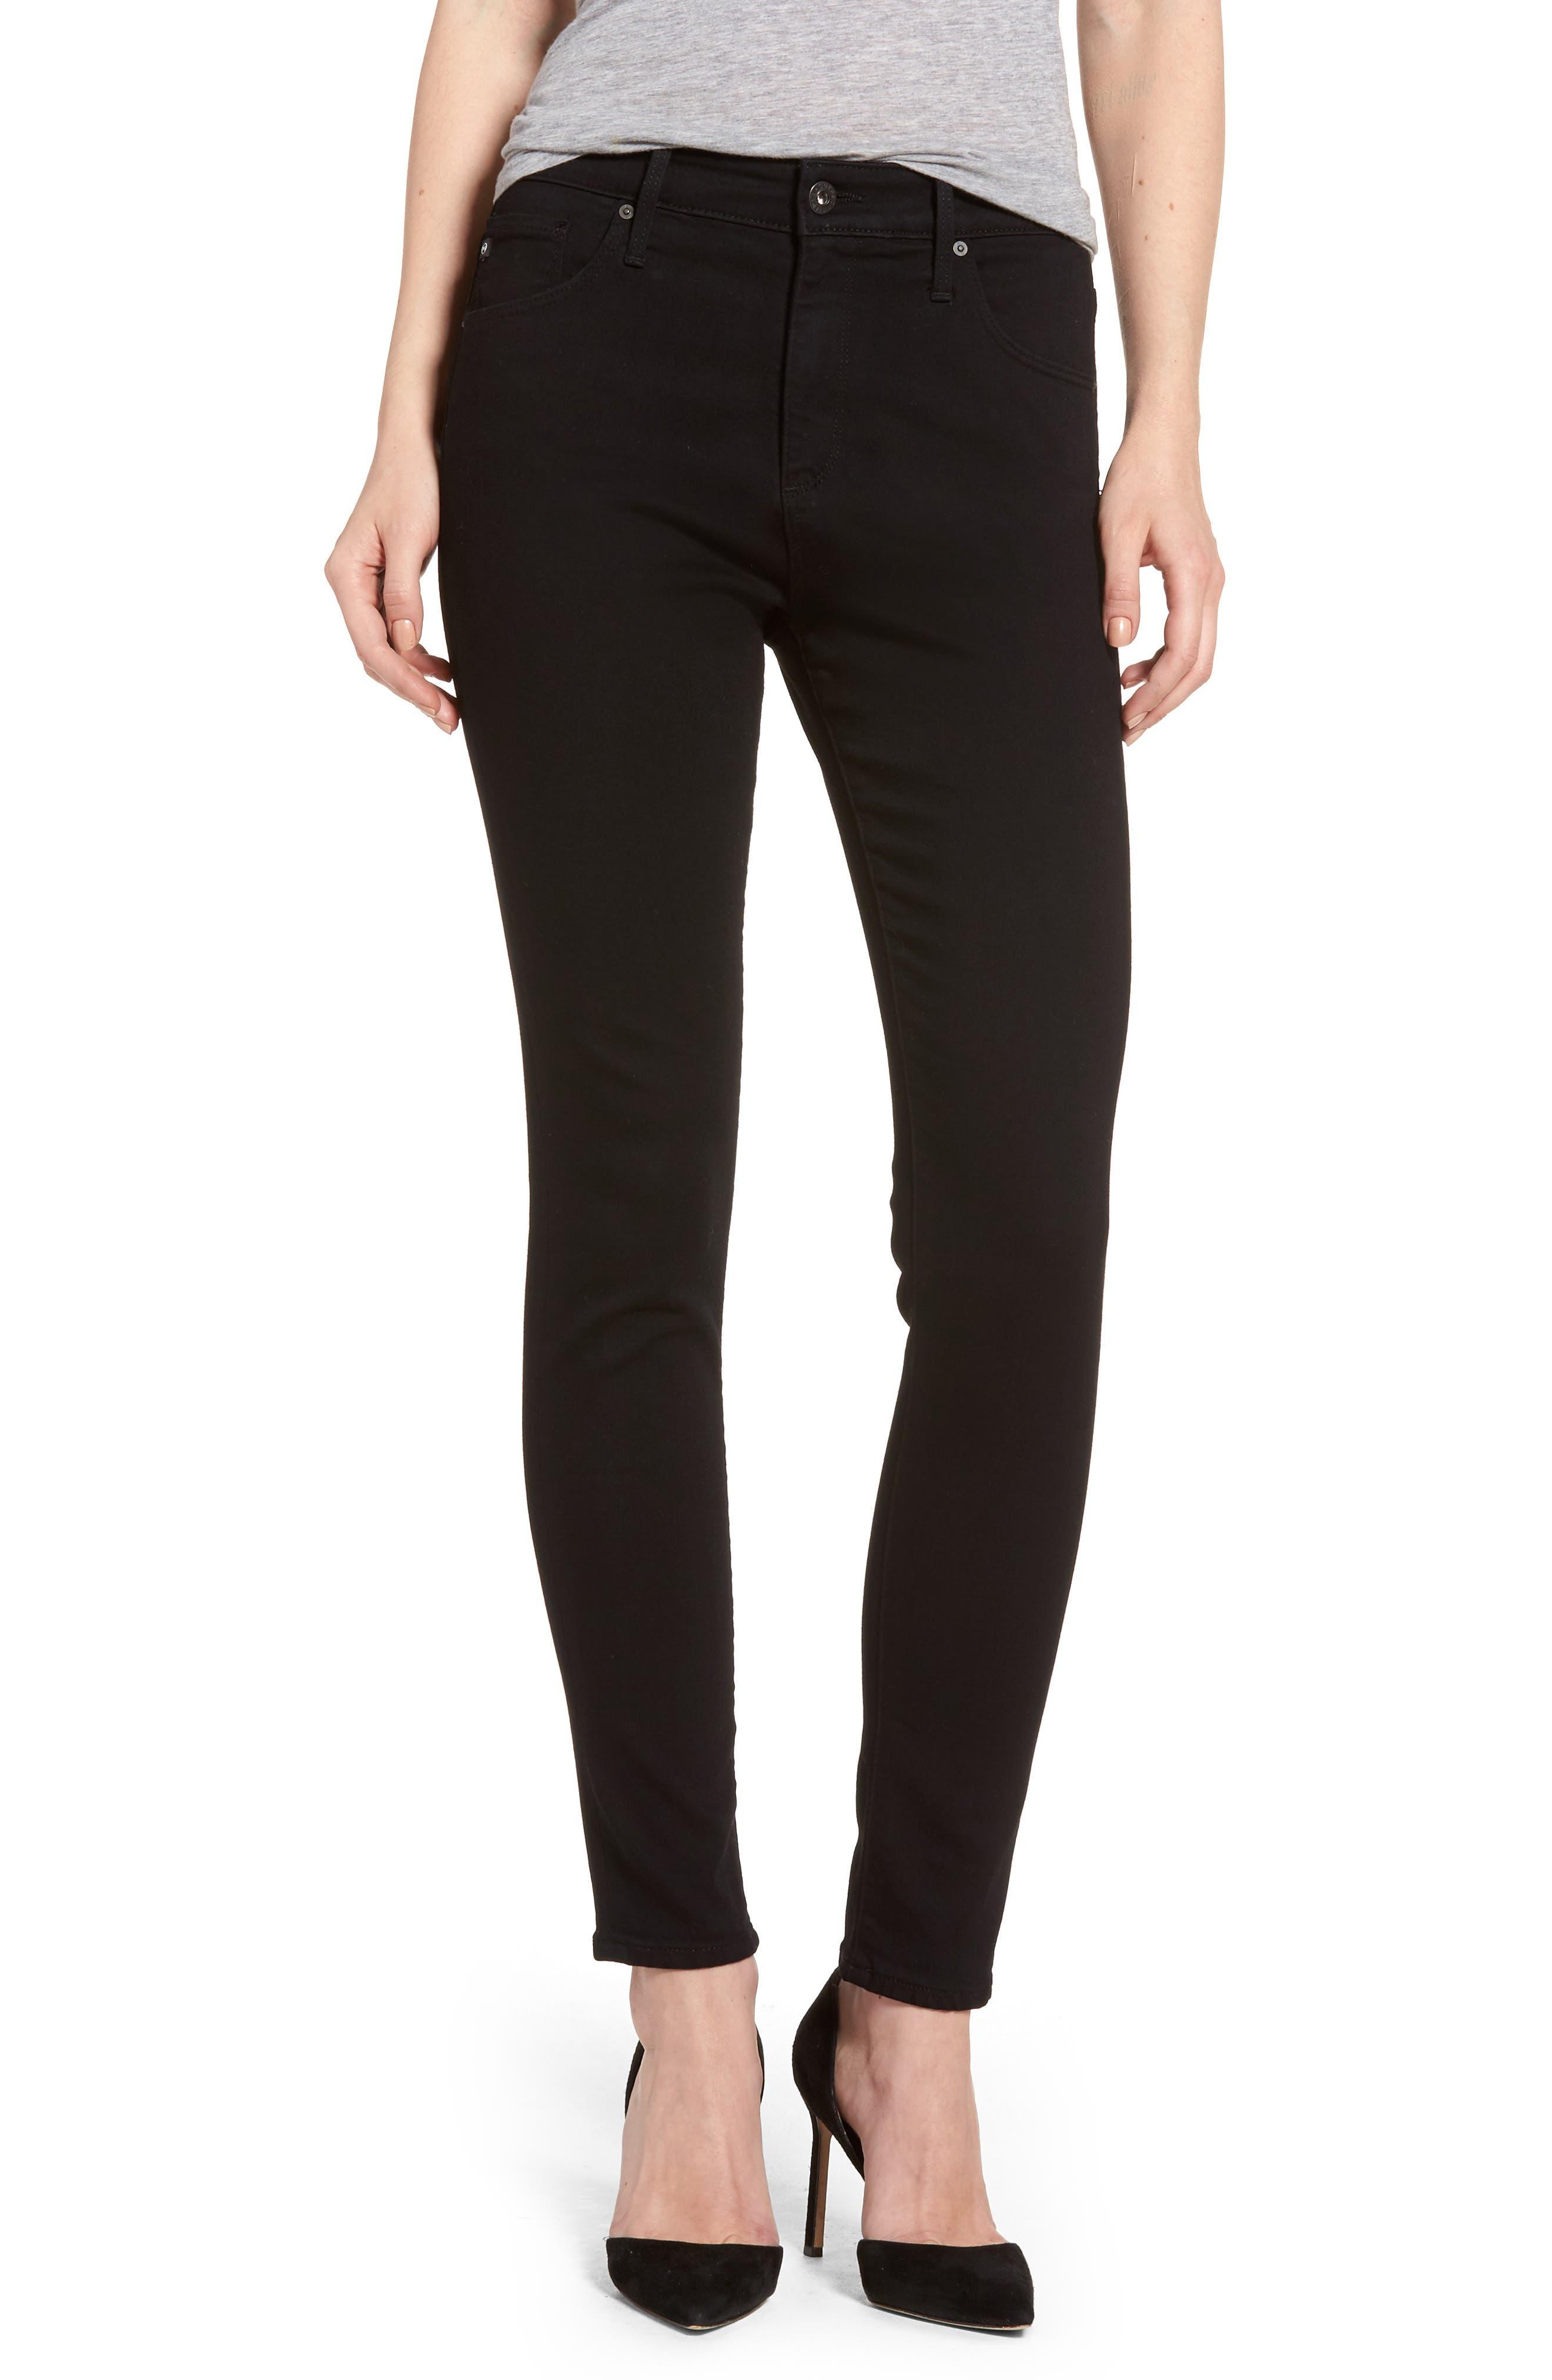 AG, Farrah High Waist Ankle Skinny Jeans, Main thumbnail 1, color, SUPER BLACK